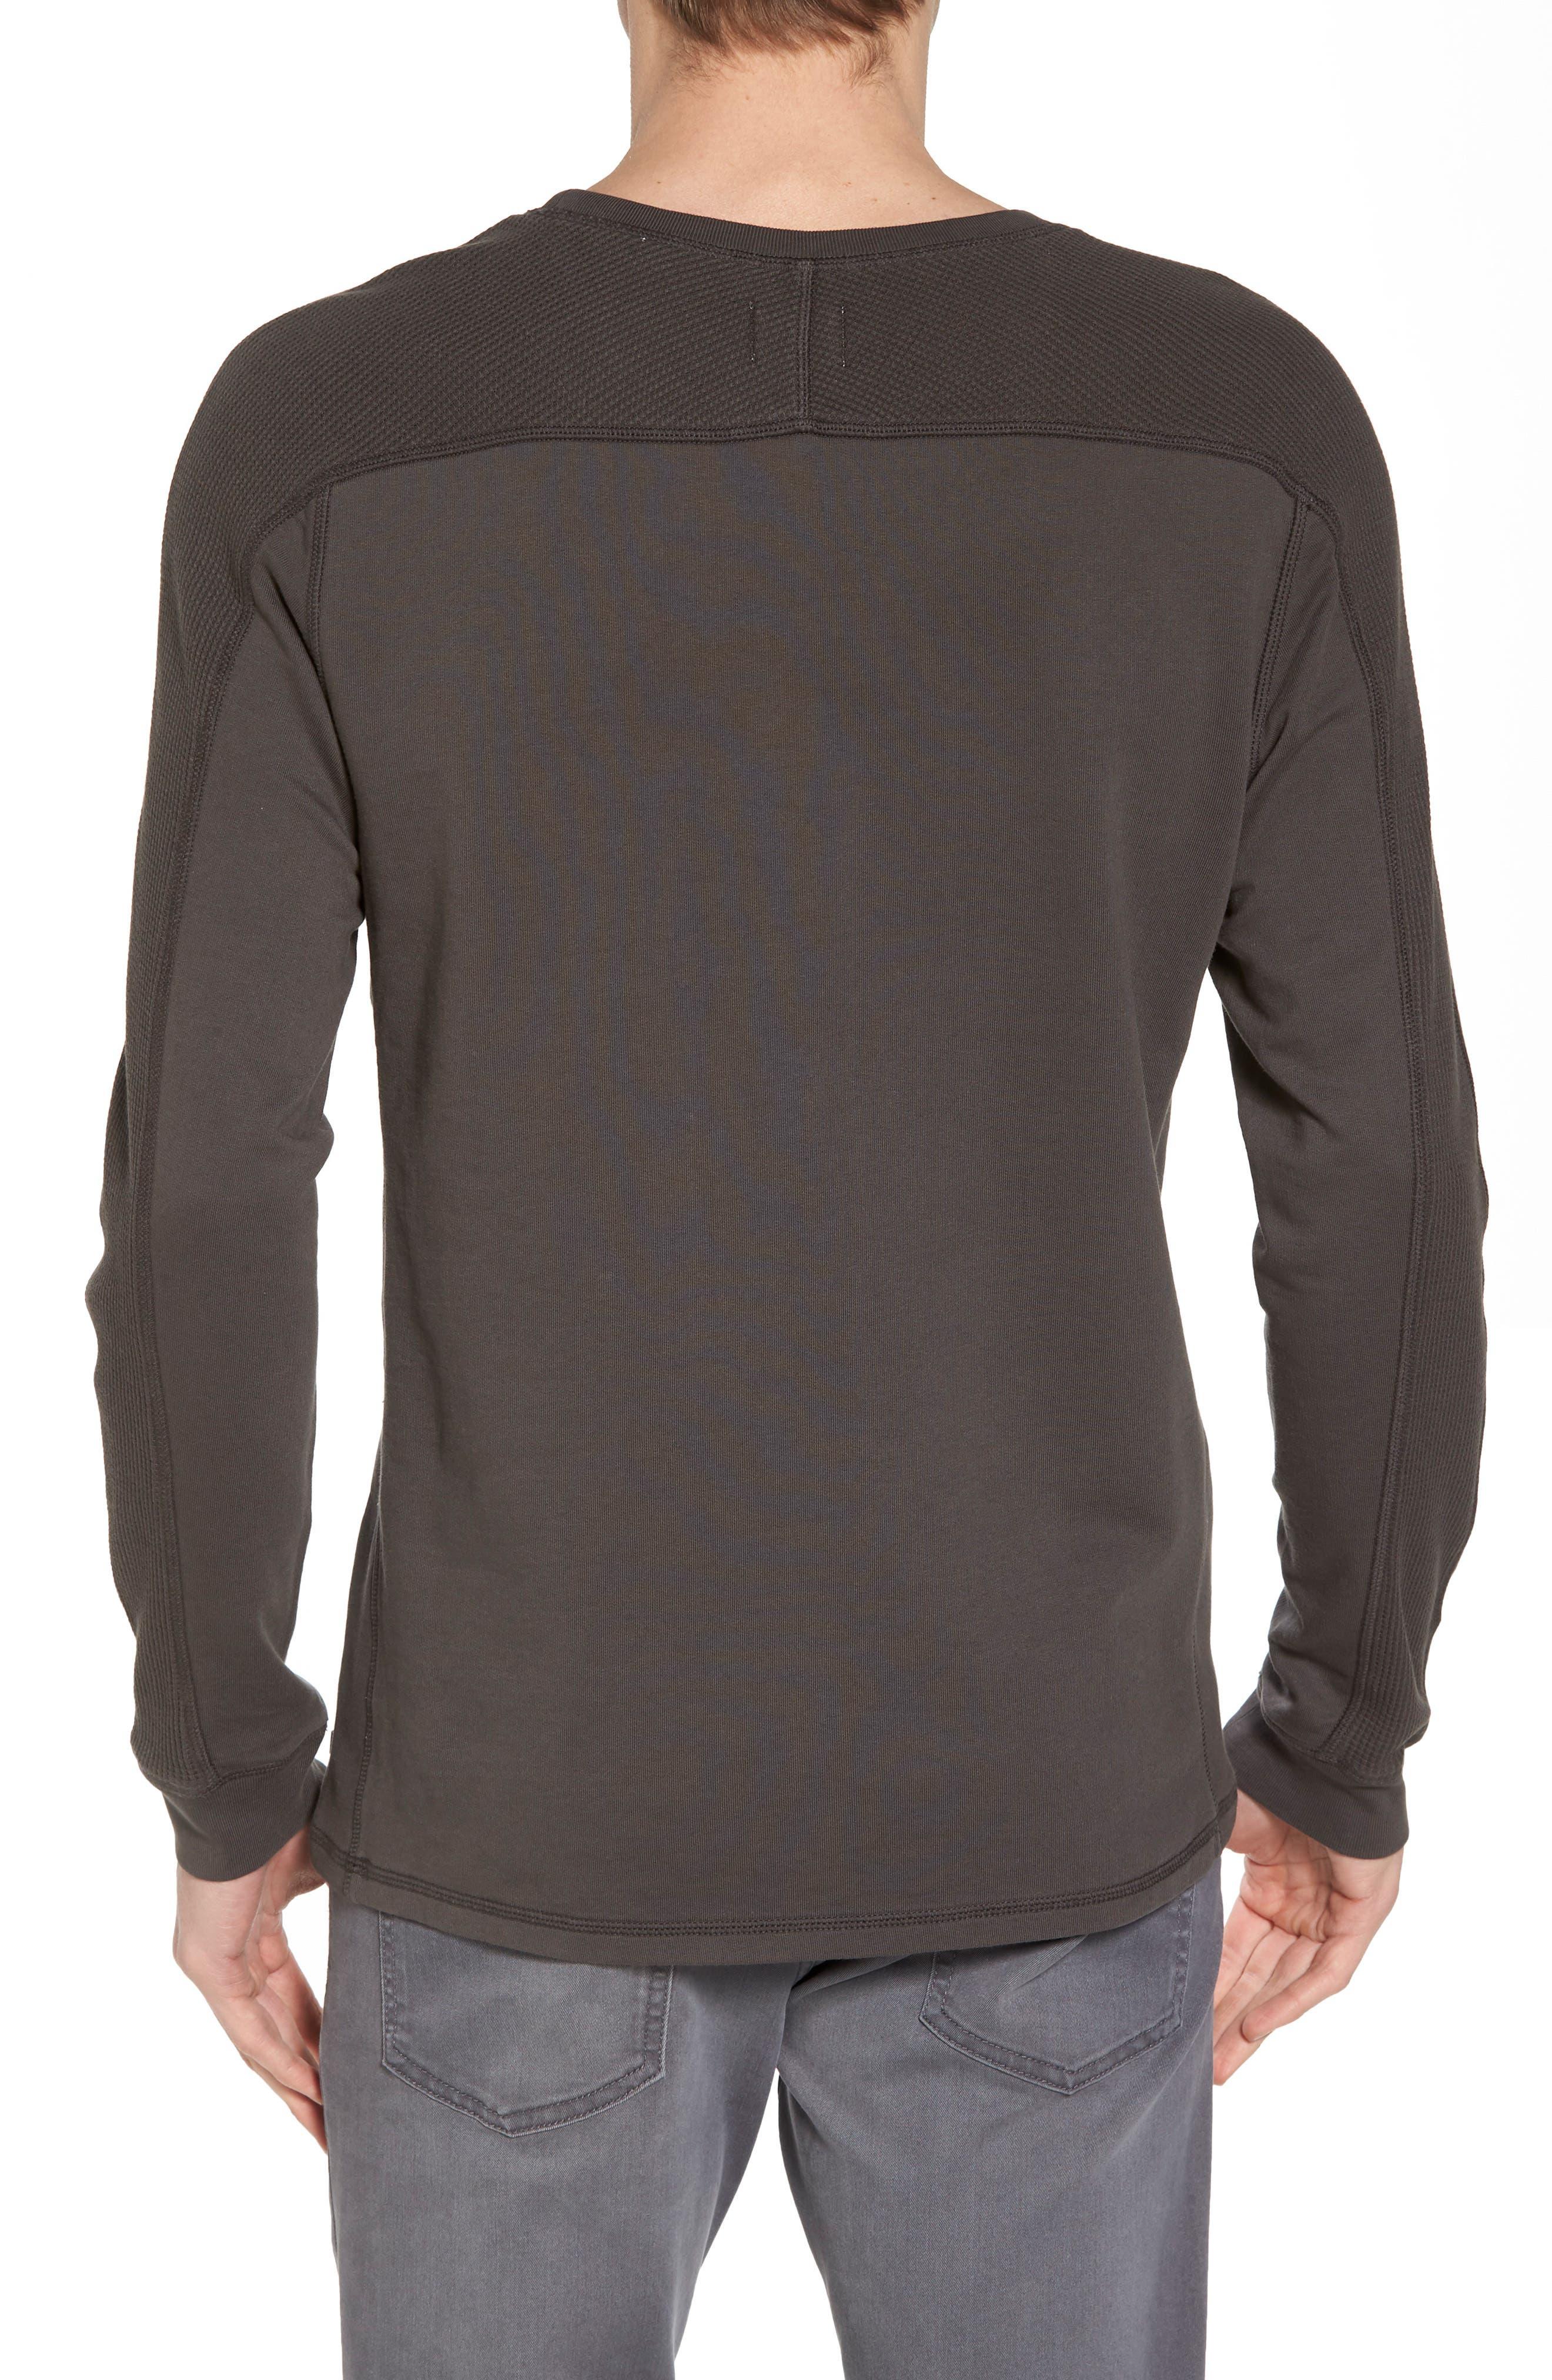 Trevor Slim Fit Crewneck Shirt,                             Alternate thumbnail 2, color,                             Smoke Grey